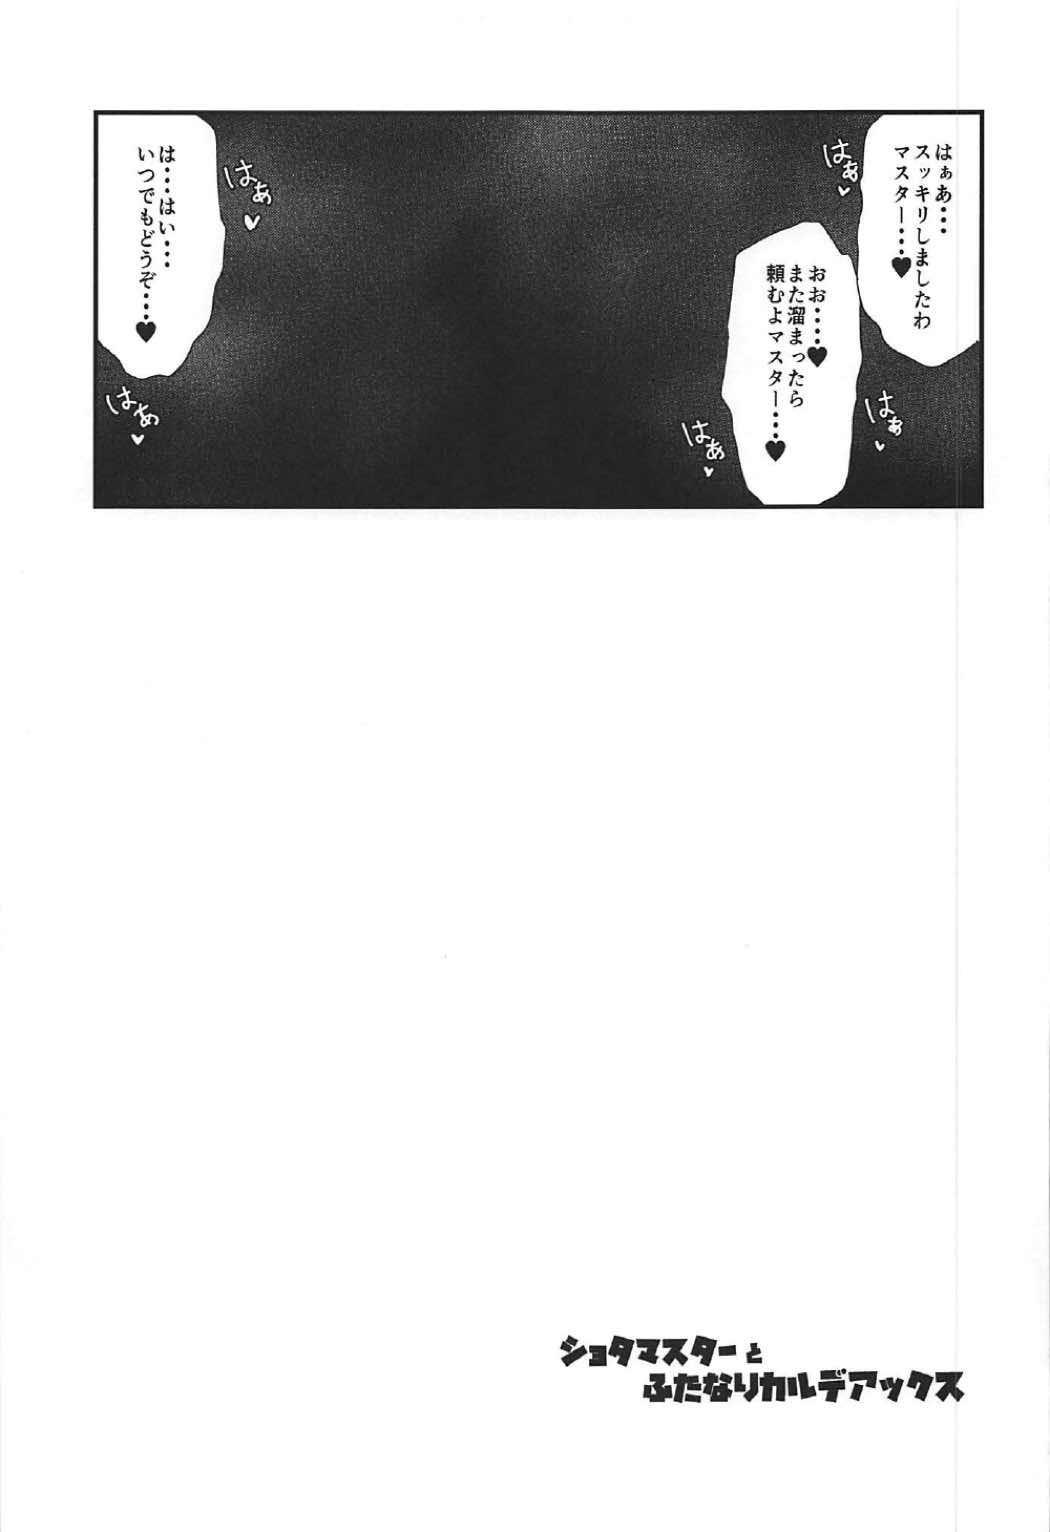 Shota Master to Futanari Chaldeax 19